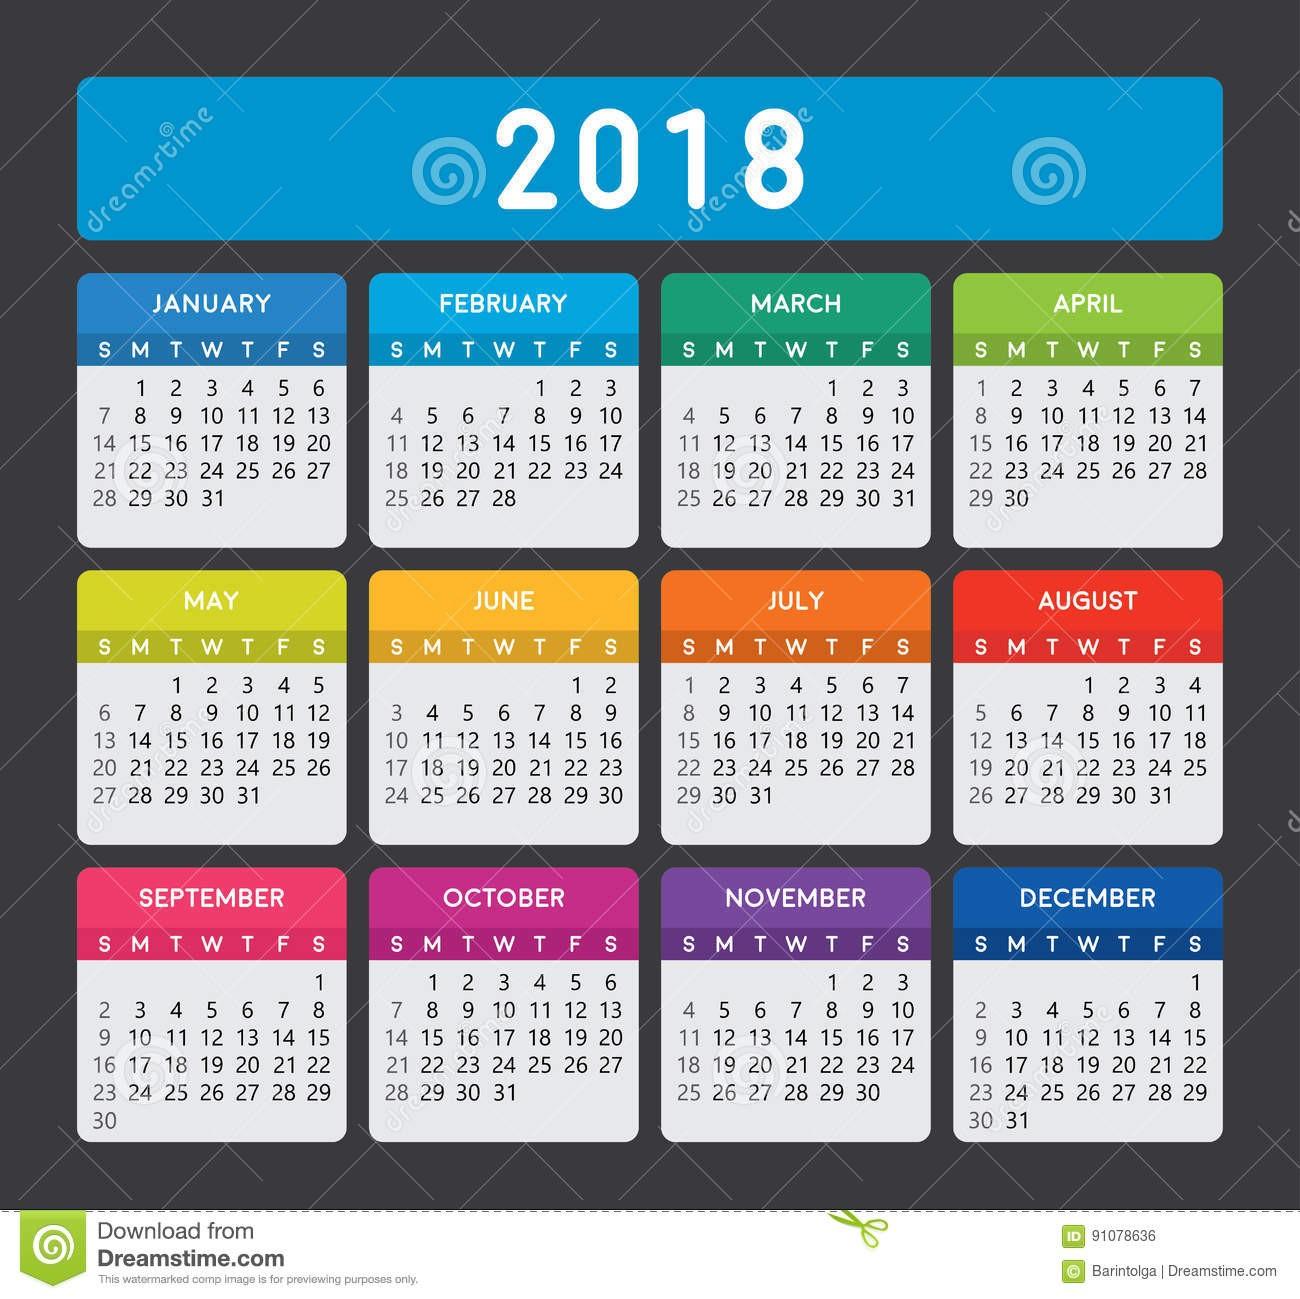 calendario 2018 colombia con festivos